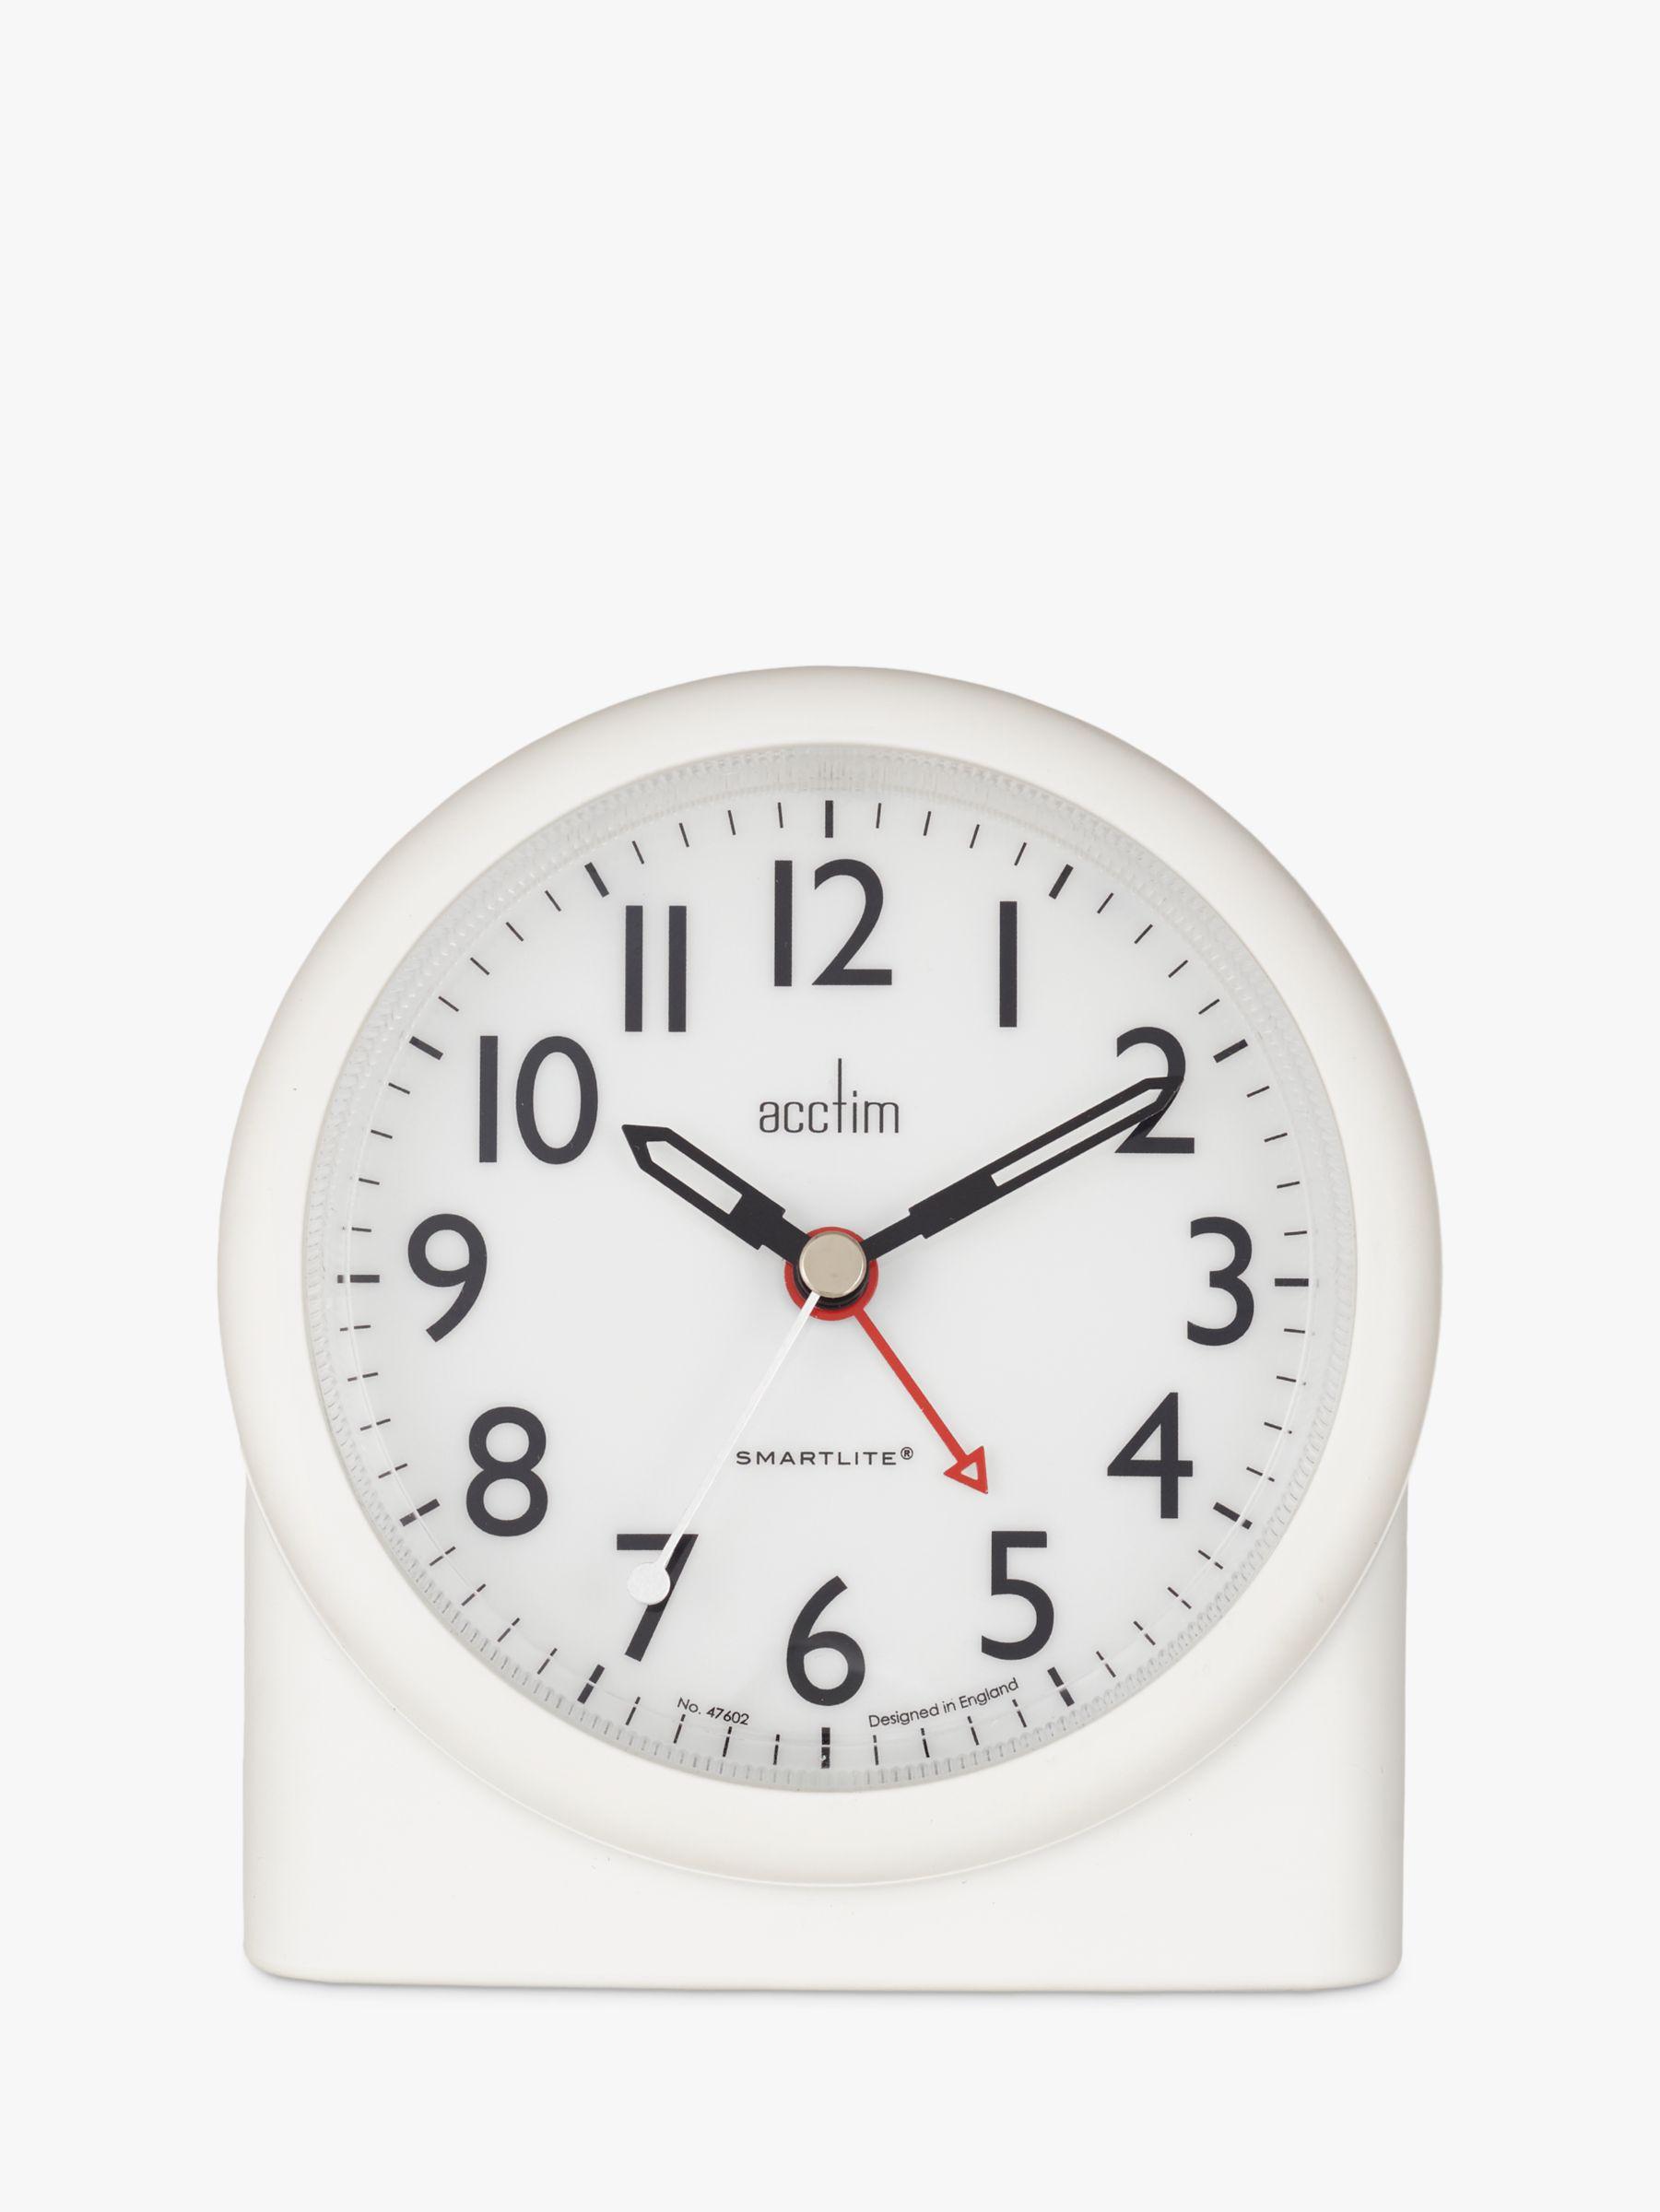 Acctim Acctim Blake Smartlite Sweep Alarm Clock, White